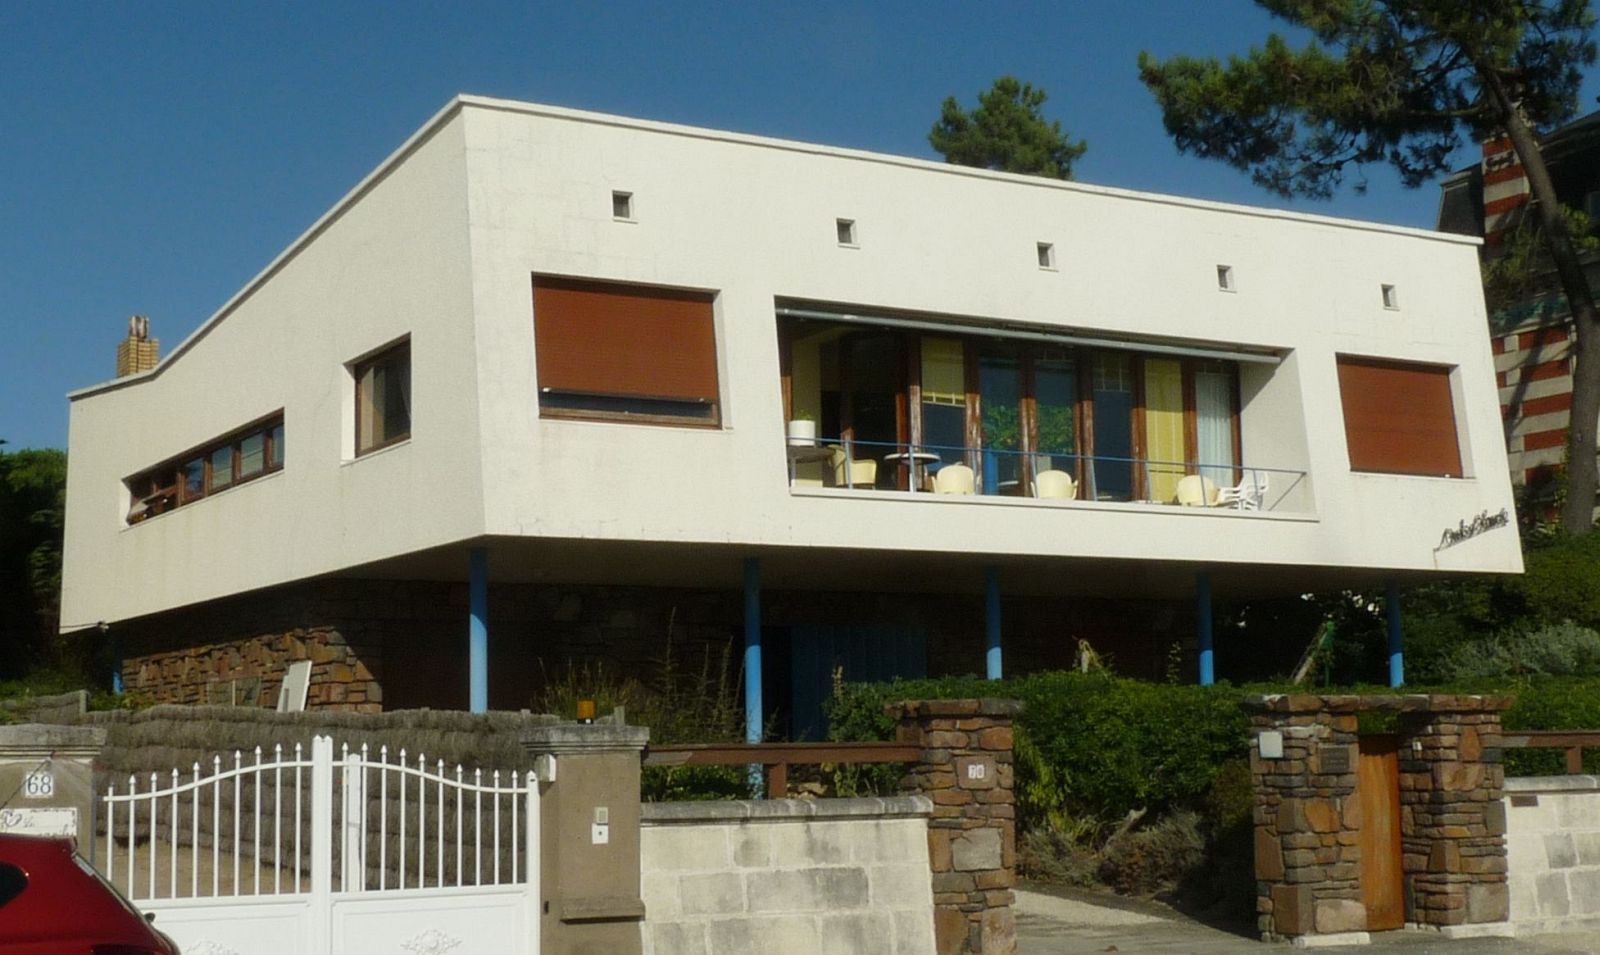 Residence Villa Liberte Melun Plan